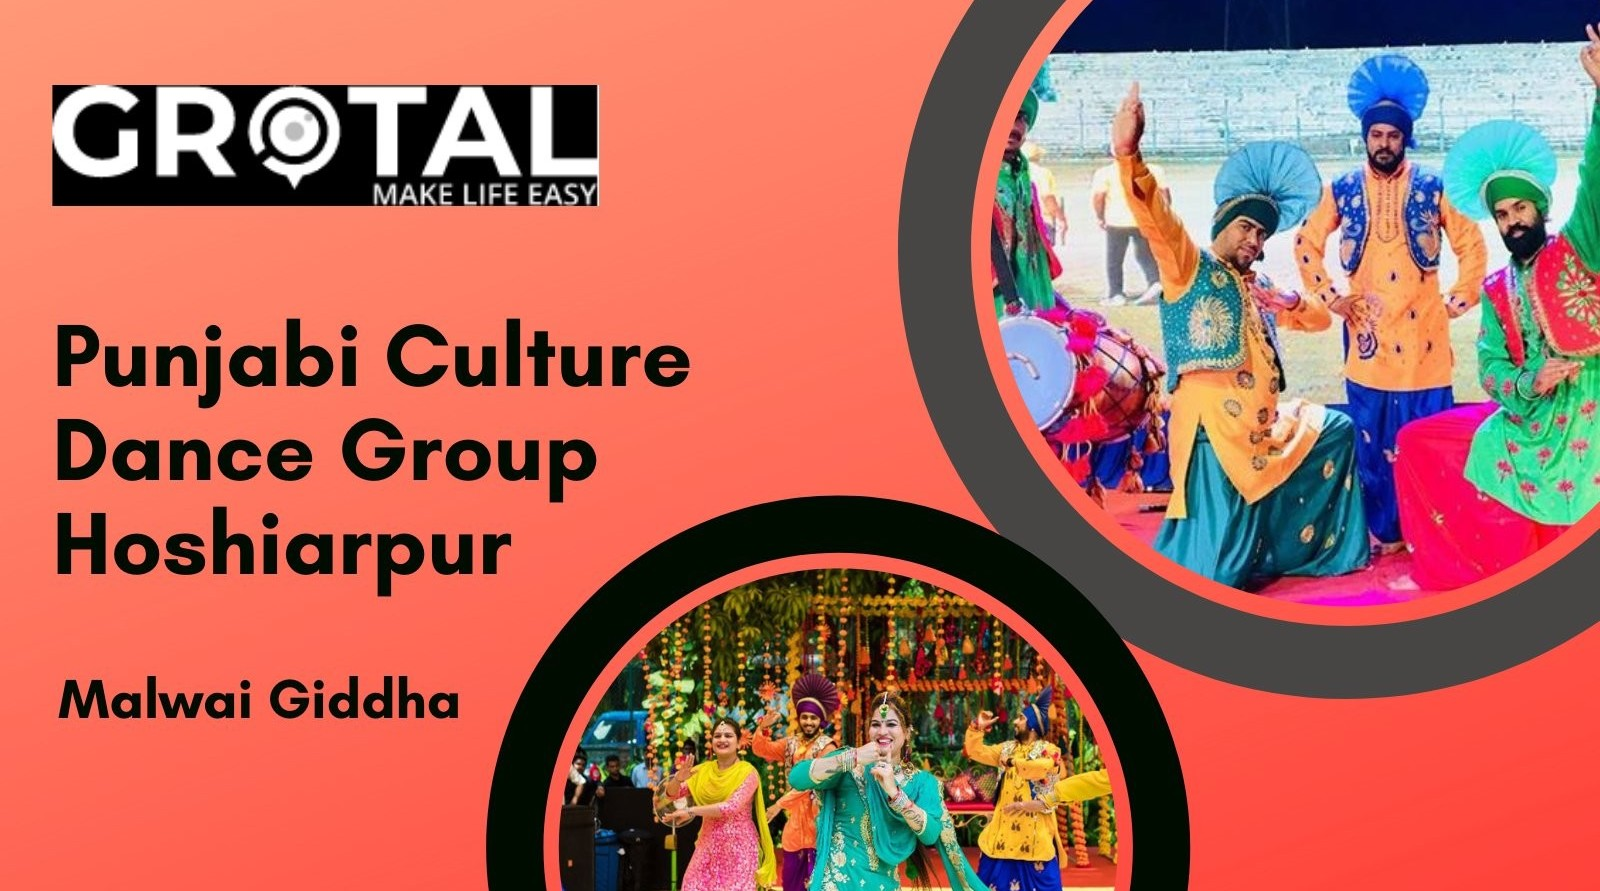 Punjabi Culture Dance Group in Hoshiarpur